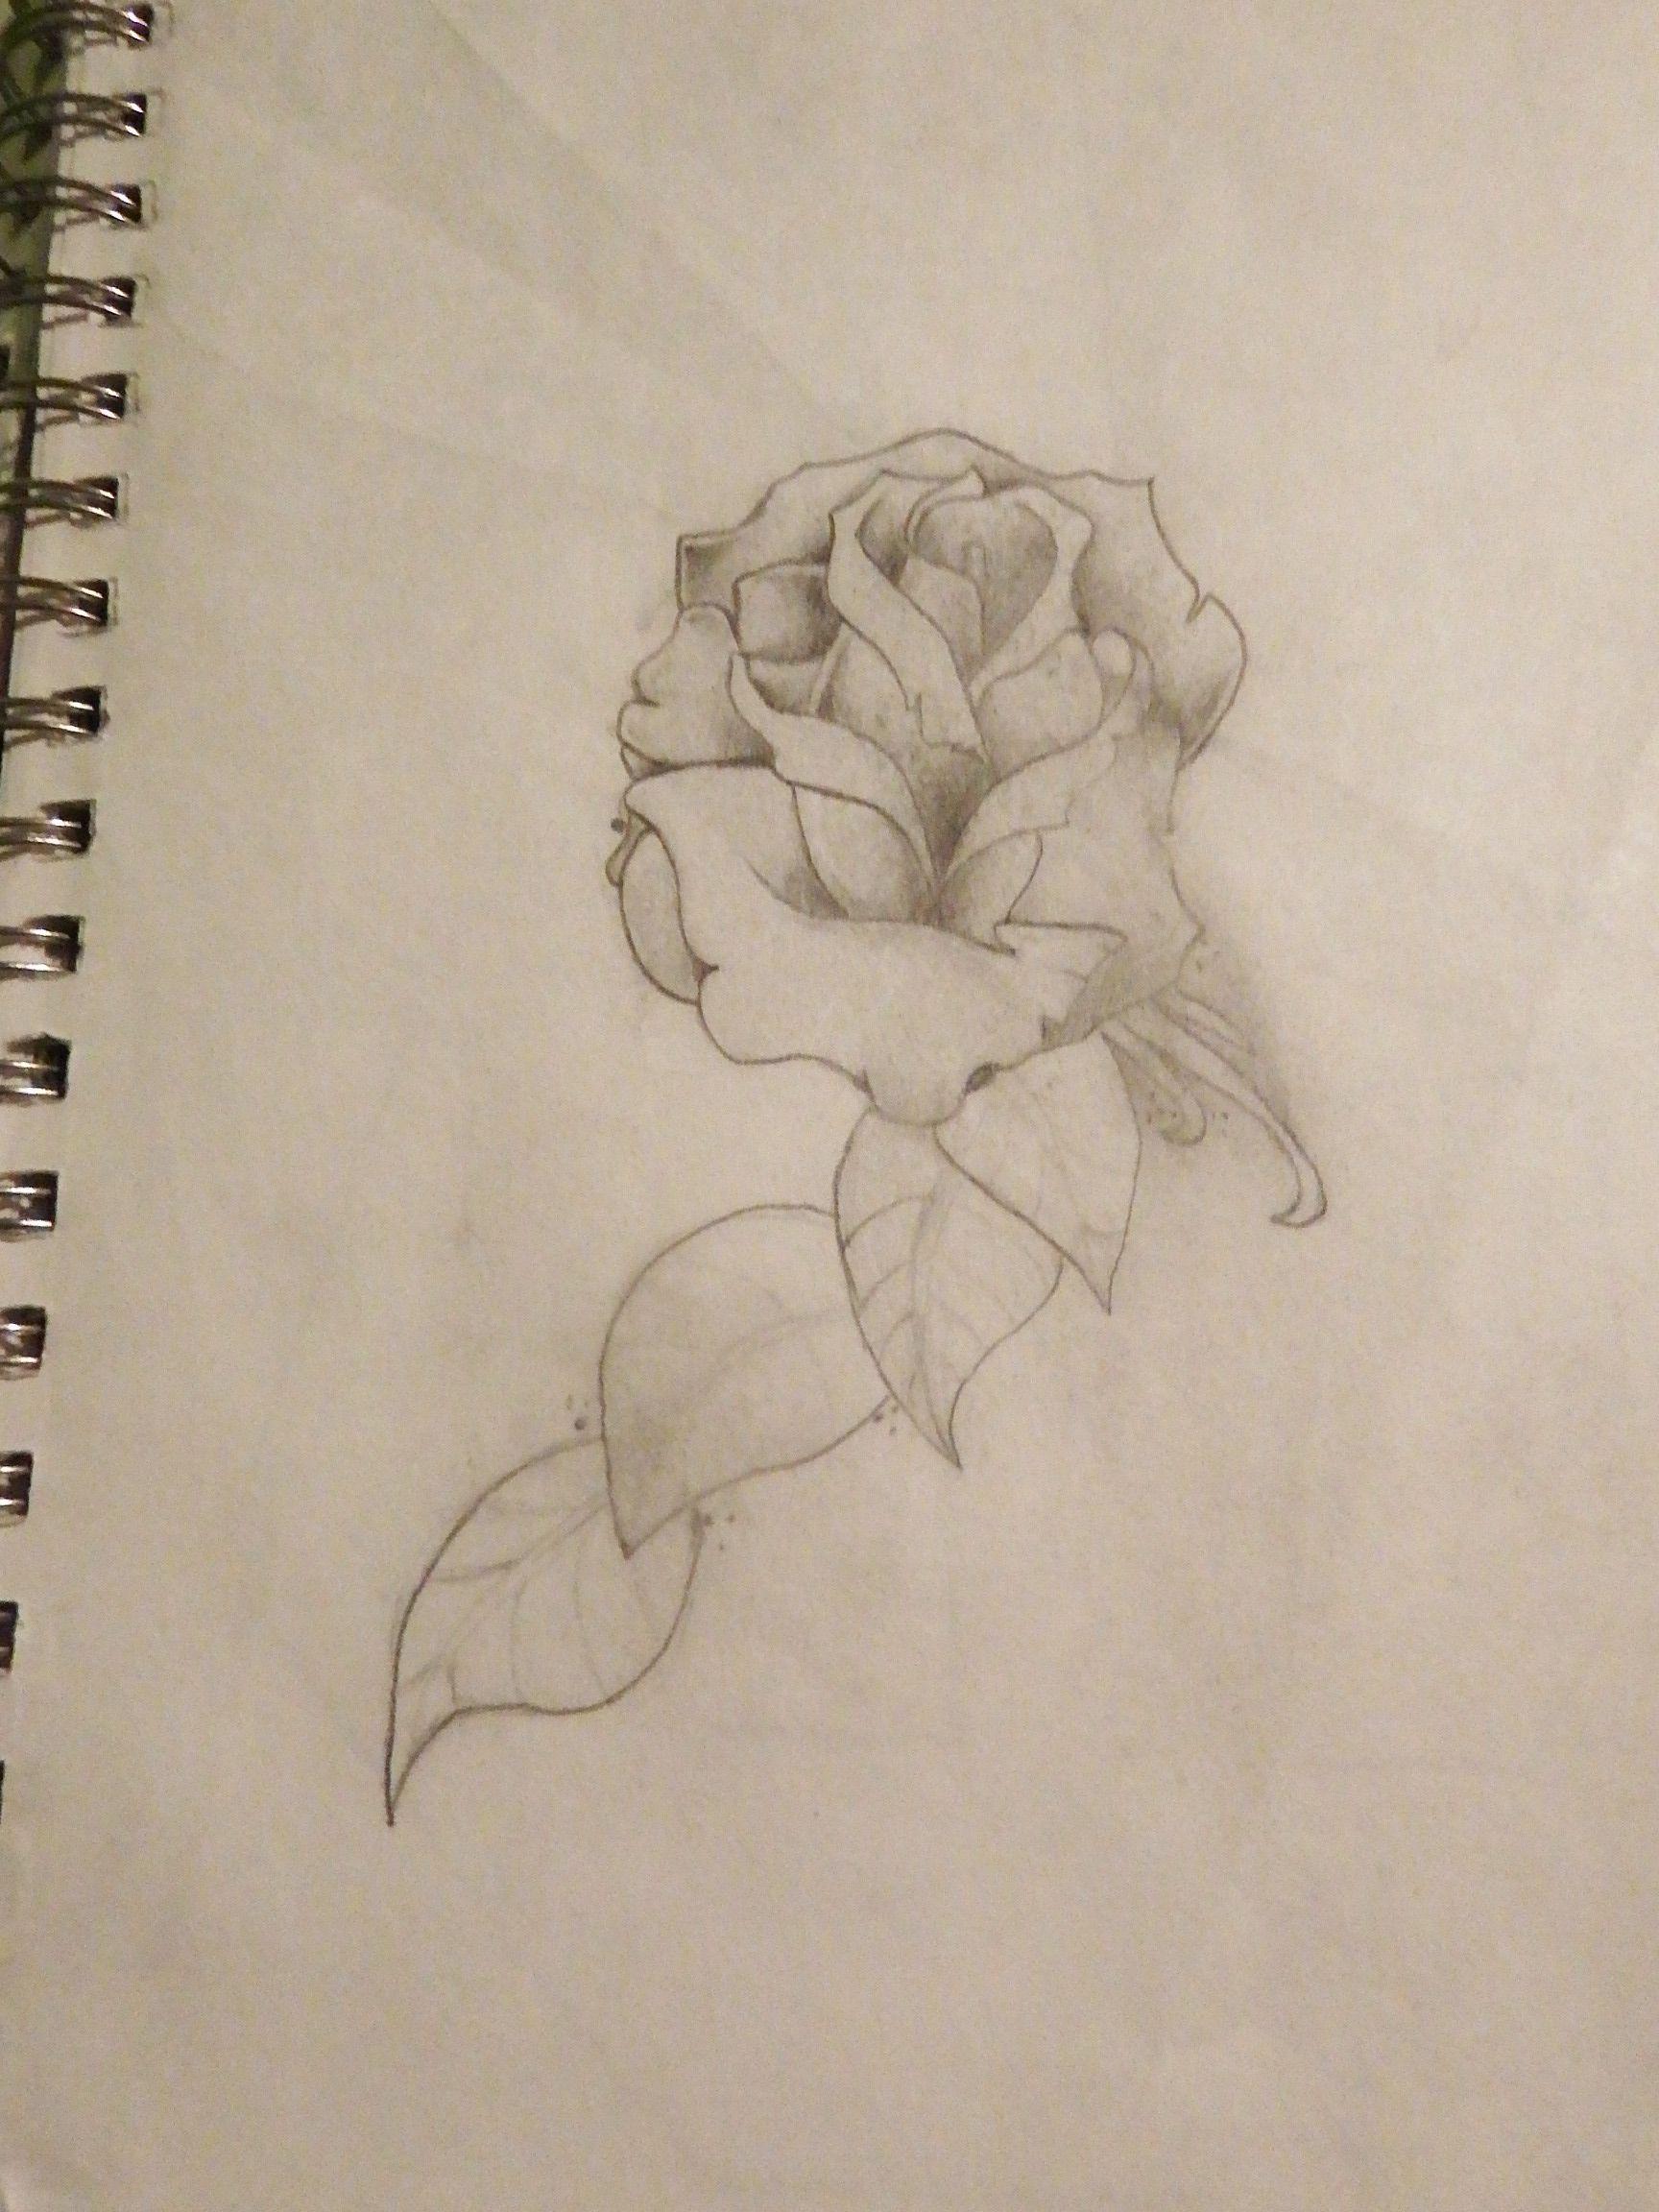 Flower drawing my own drawings pinterest drawings